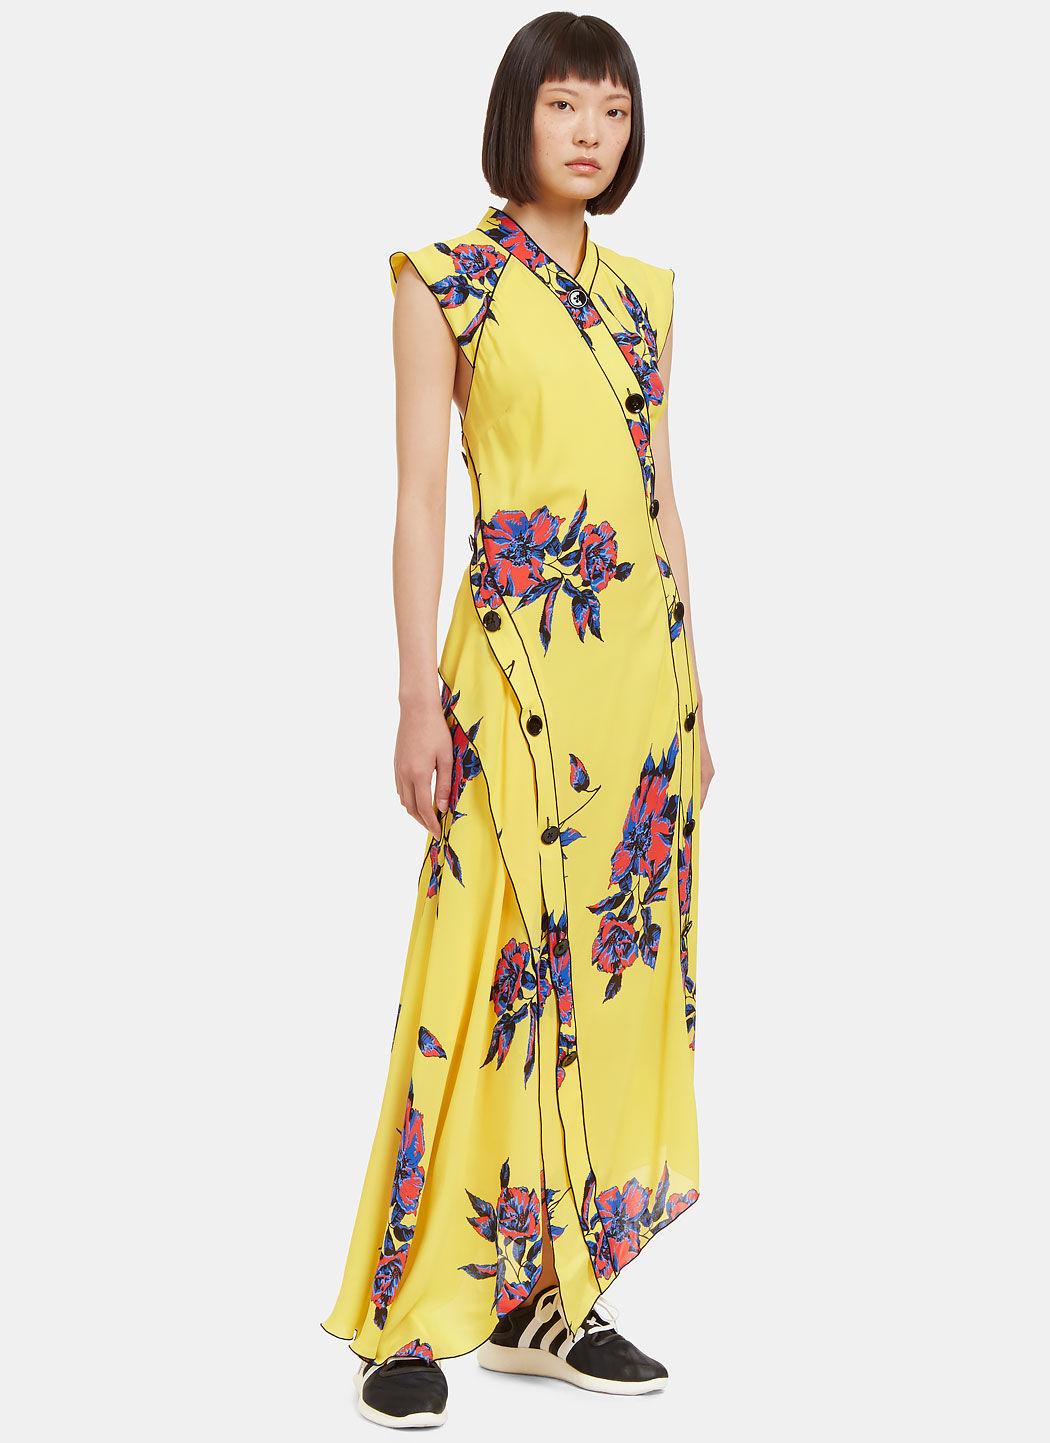 Proenza Schouler Silks Women's Long Lily Print Asymmetric Frilled Dress in Yellow